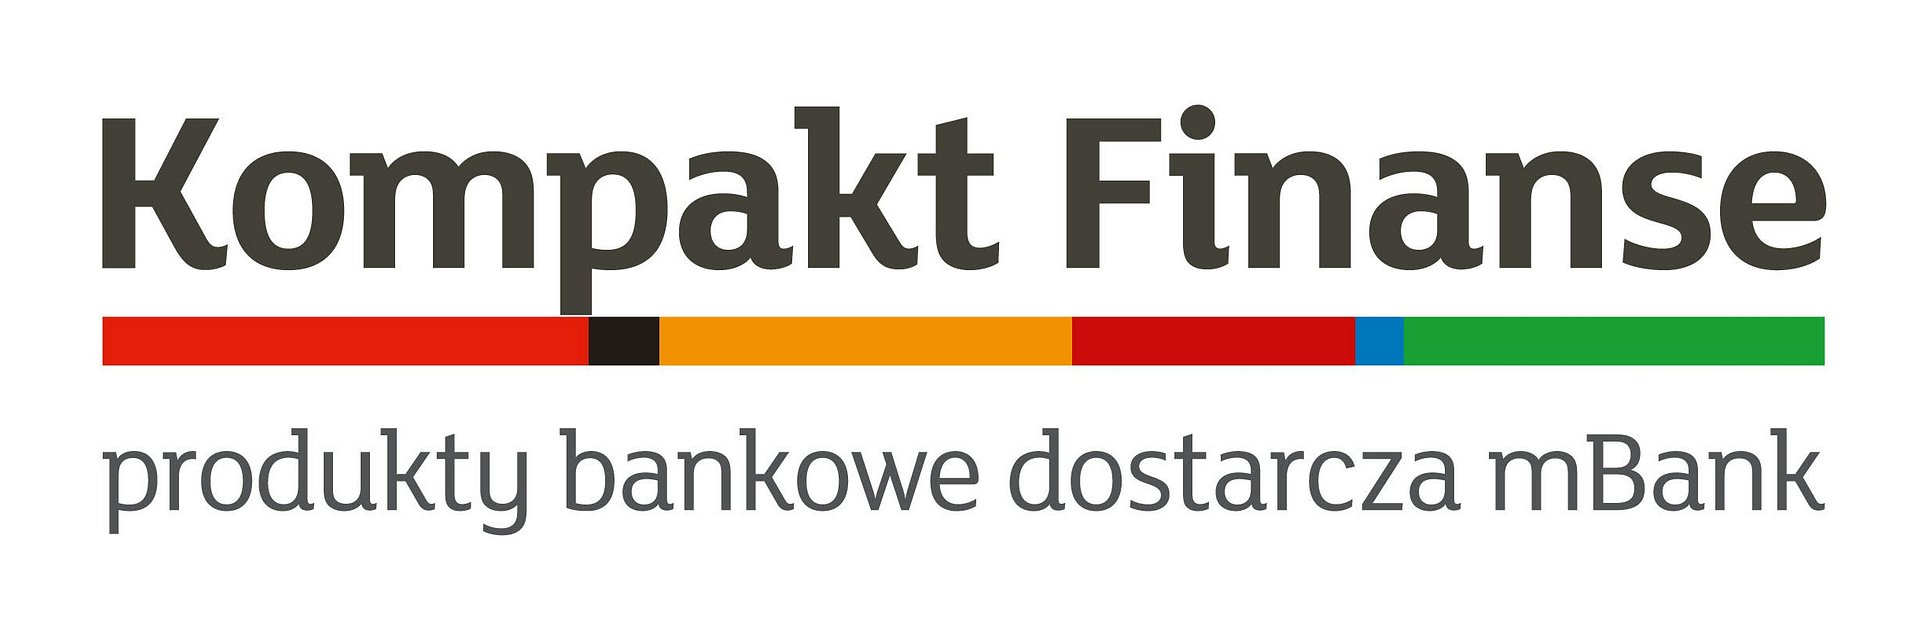 Orange Finanse zmienia nazwę na Kompakt Finanse